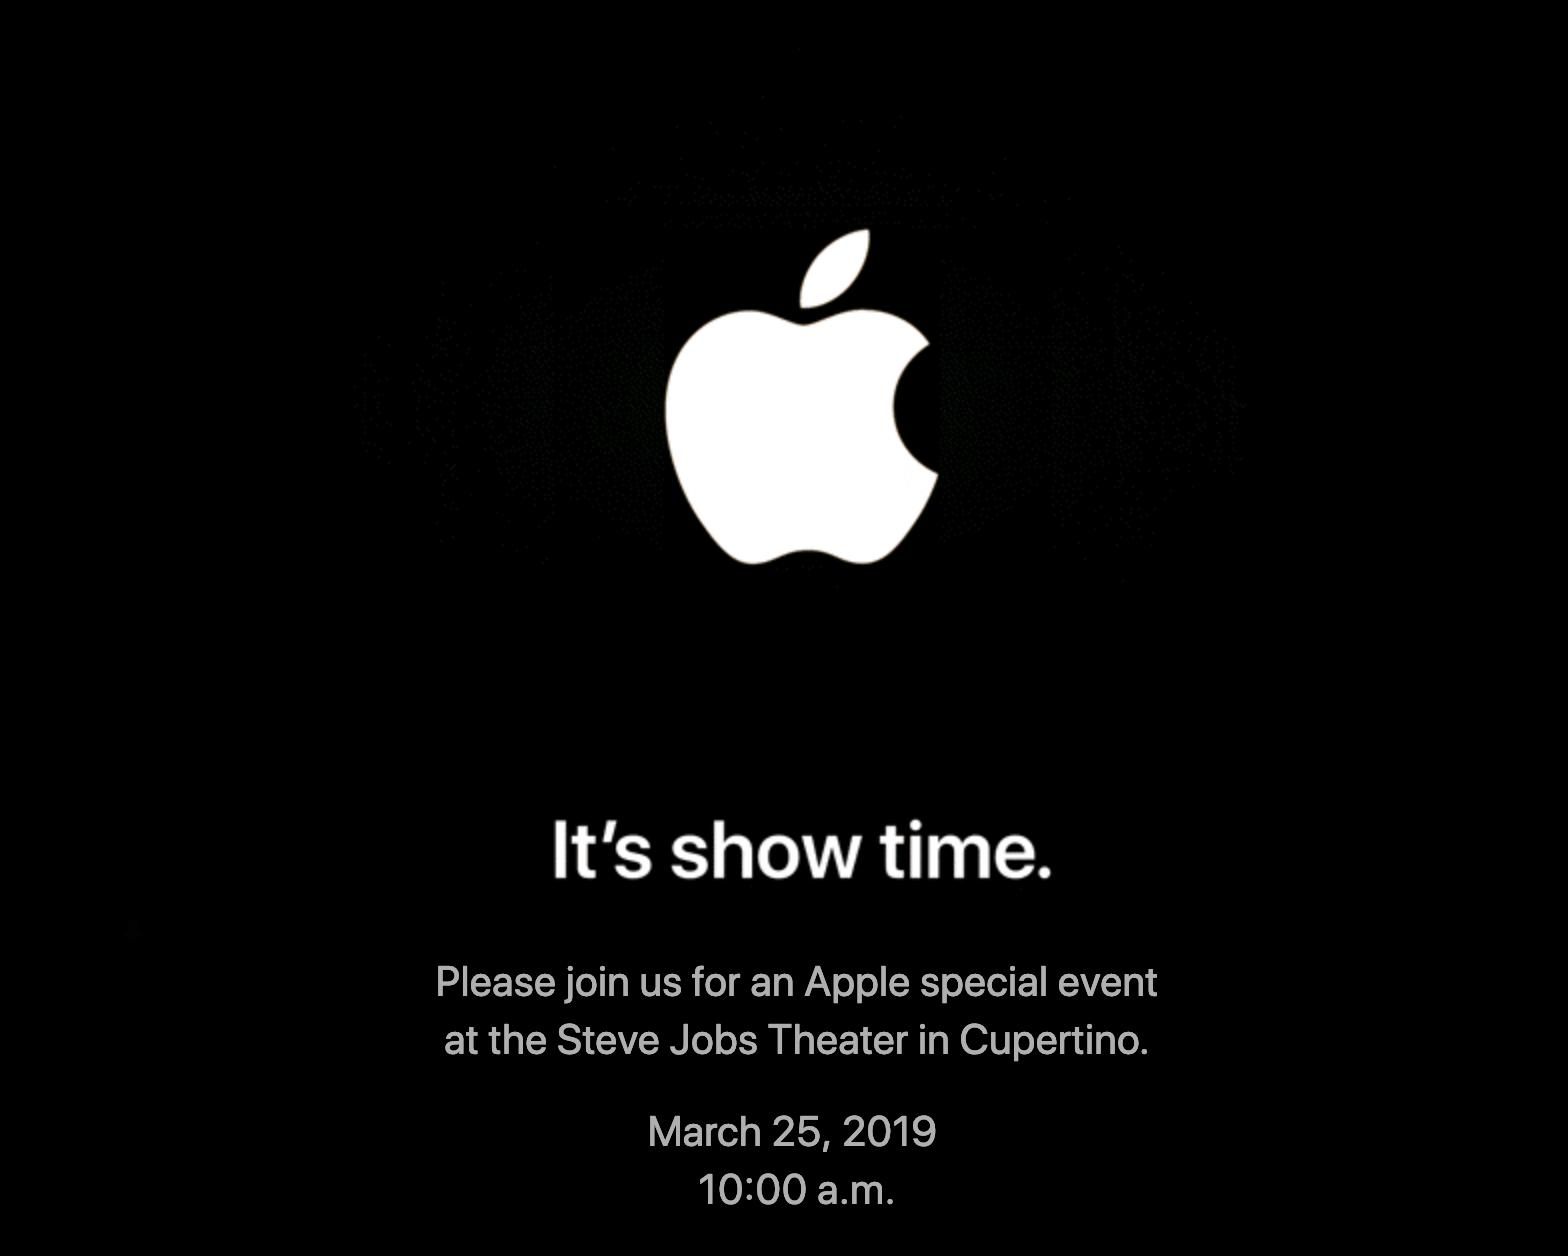 Evento especial de presentación de Apple: it's show time (invitación)